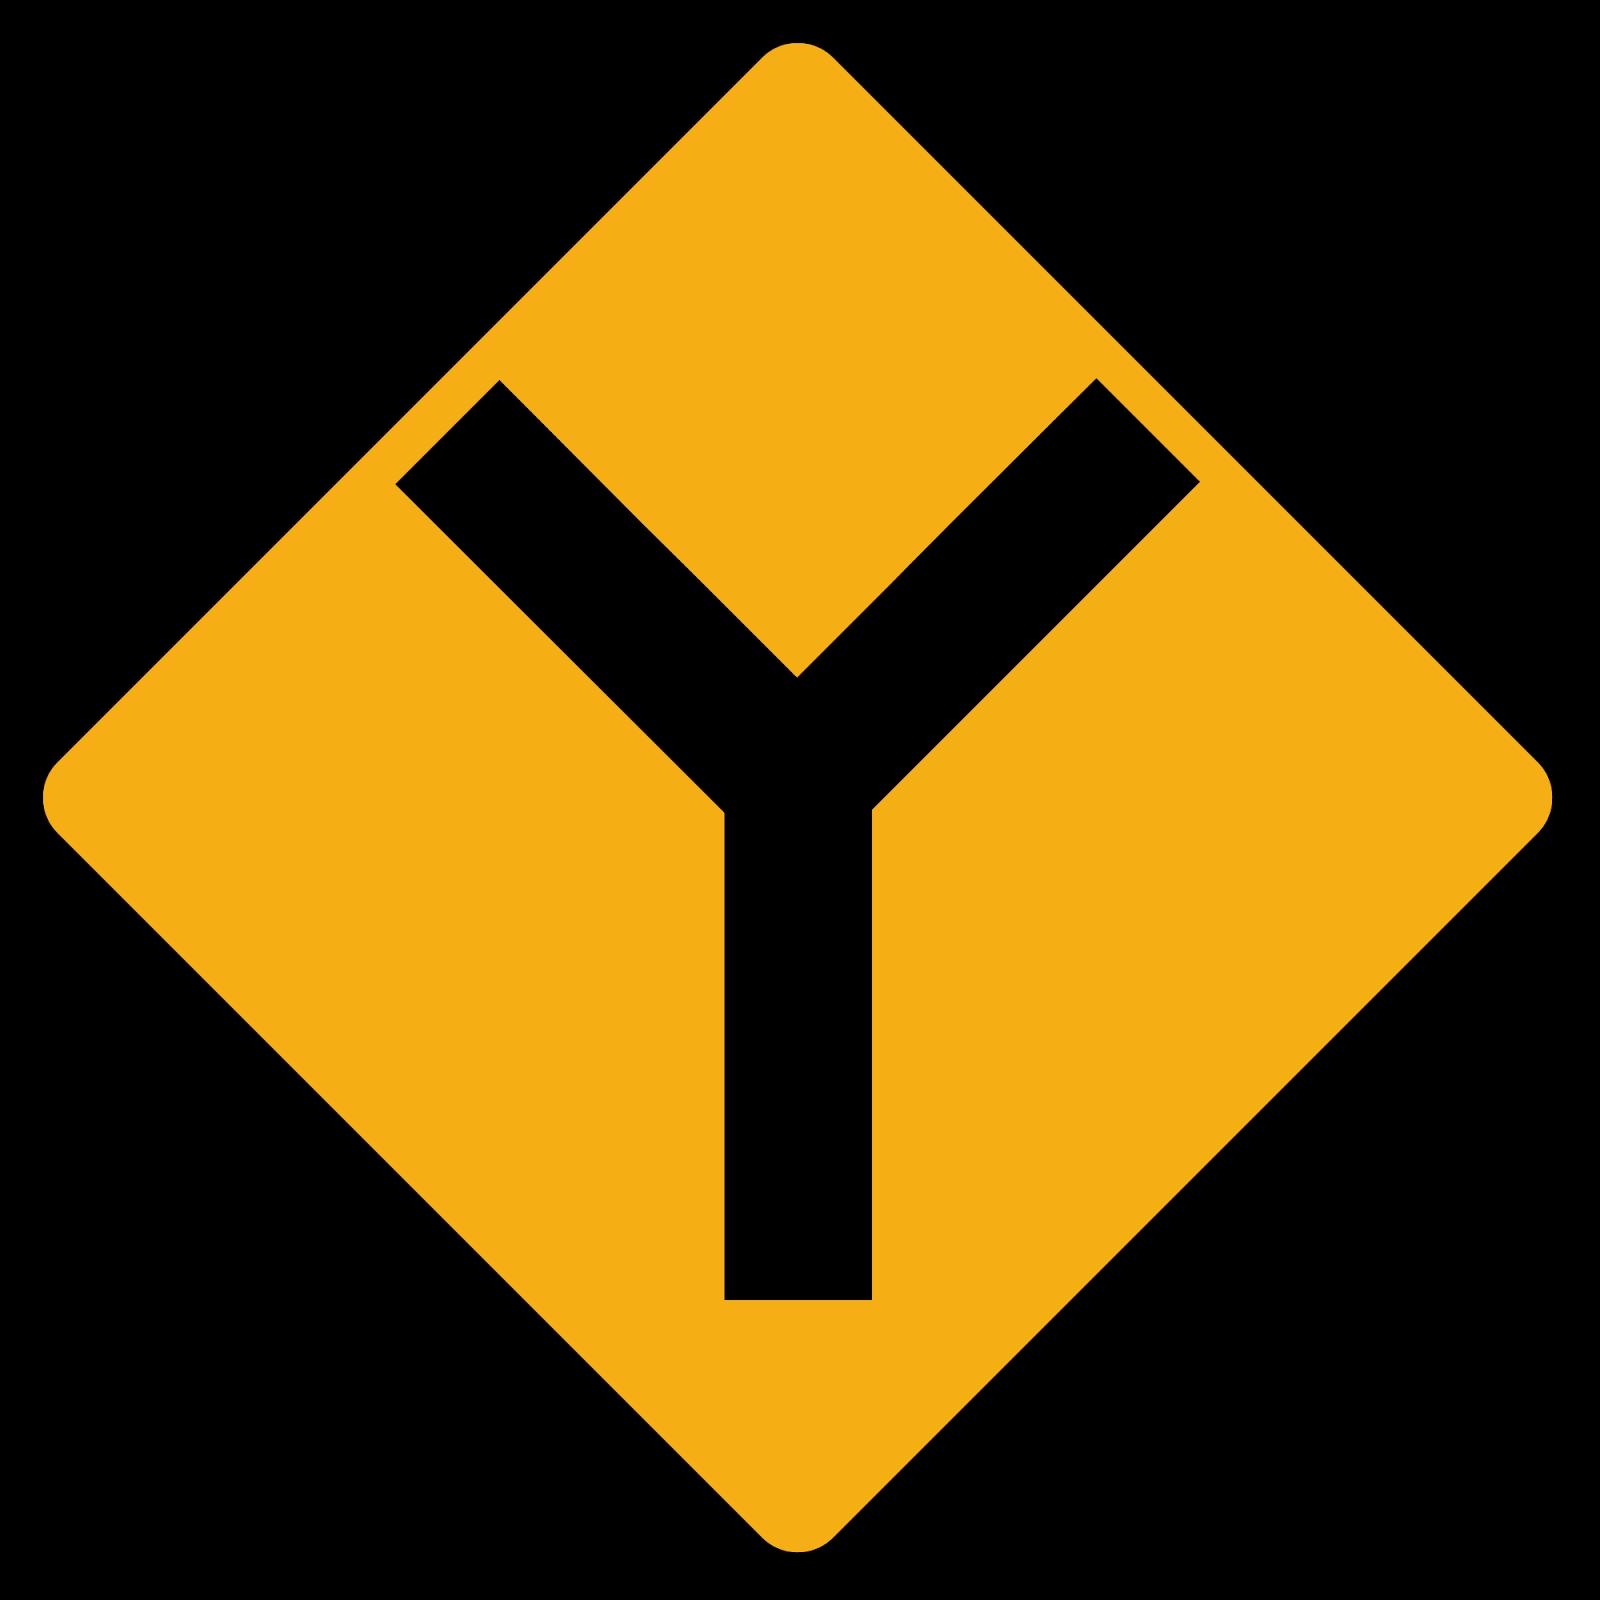 Diamond road sign Y junction. ...